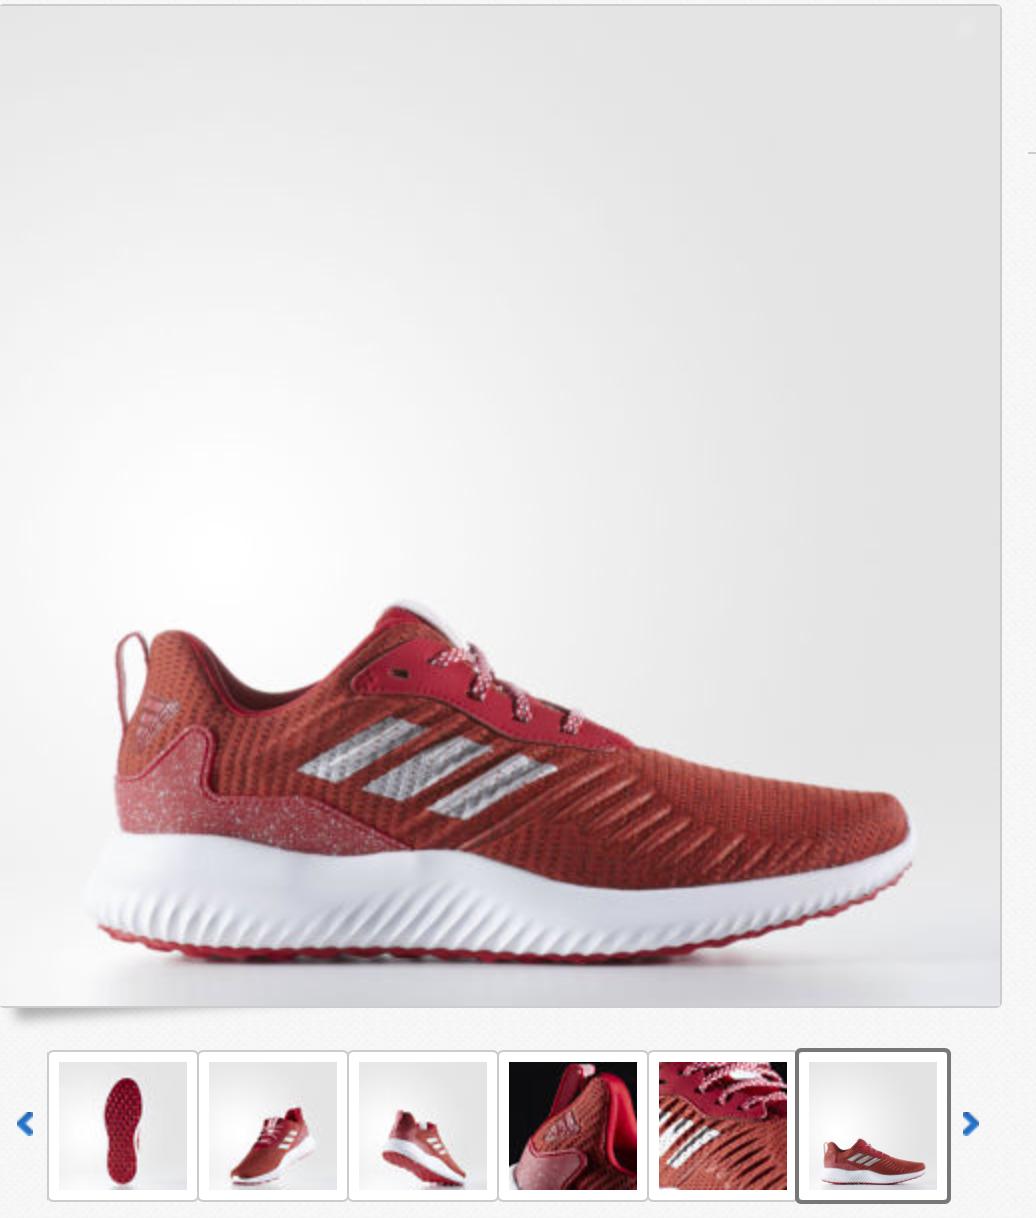 acheter pas cher 30408 c2f33 Adidas Alphabounce RC Shoes Men's $31.46 (Pre-tax +Free ...